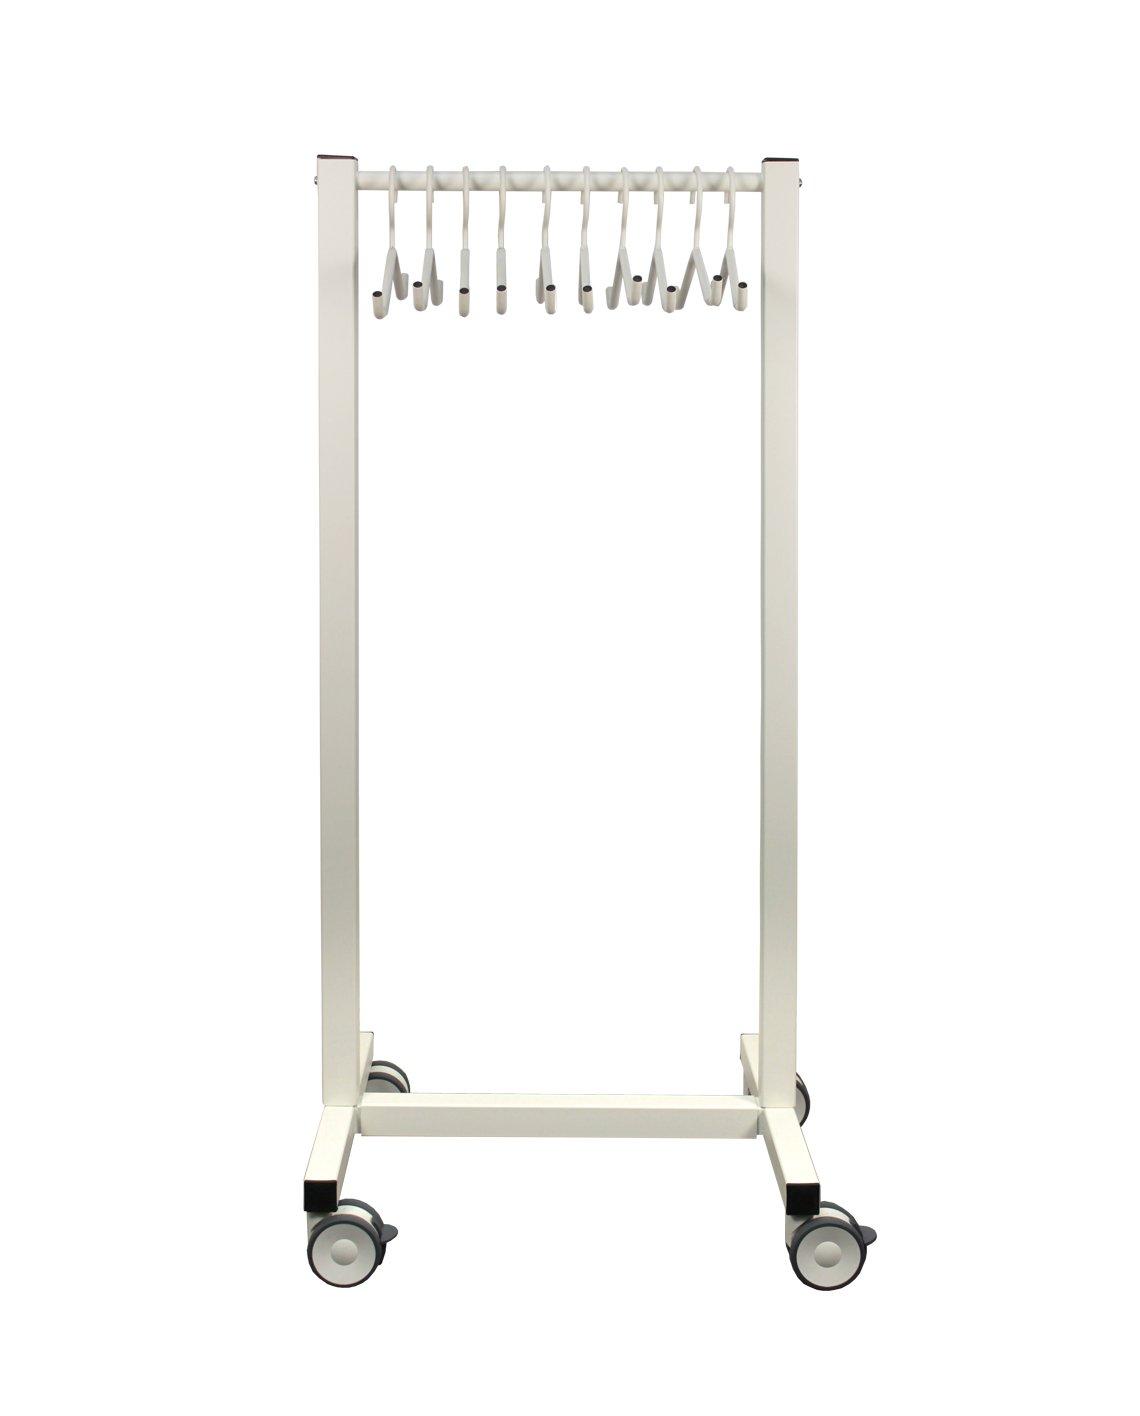 10 Hanger X Ray Apron Rack